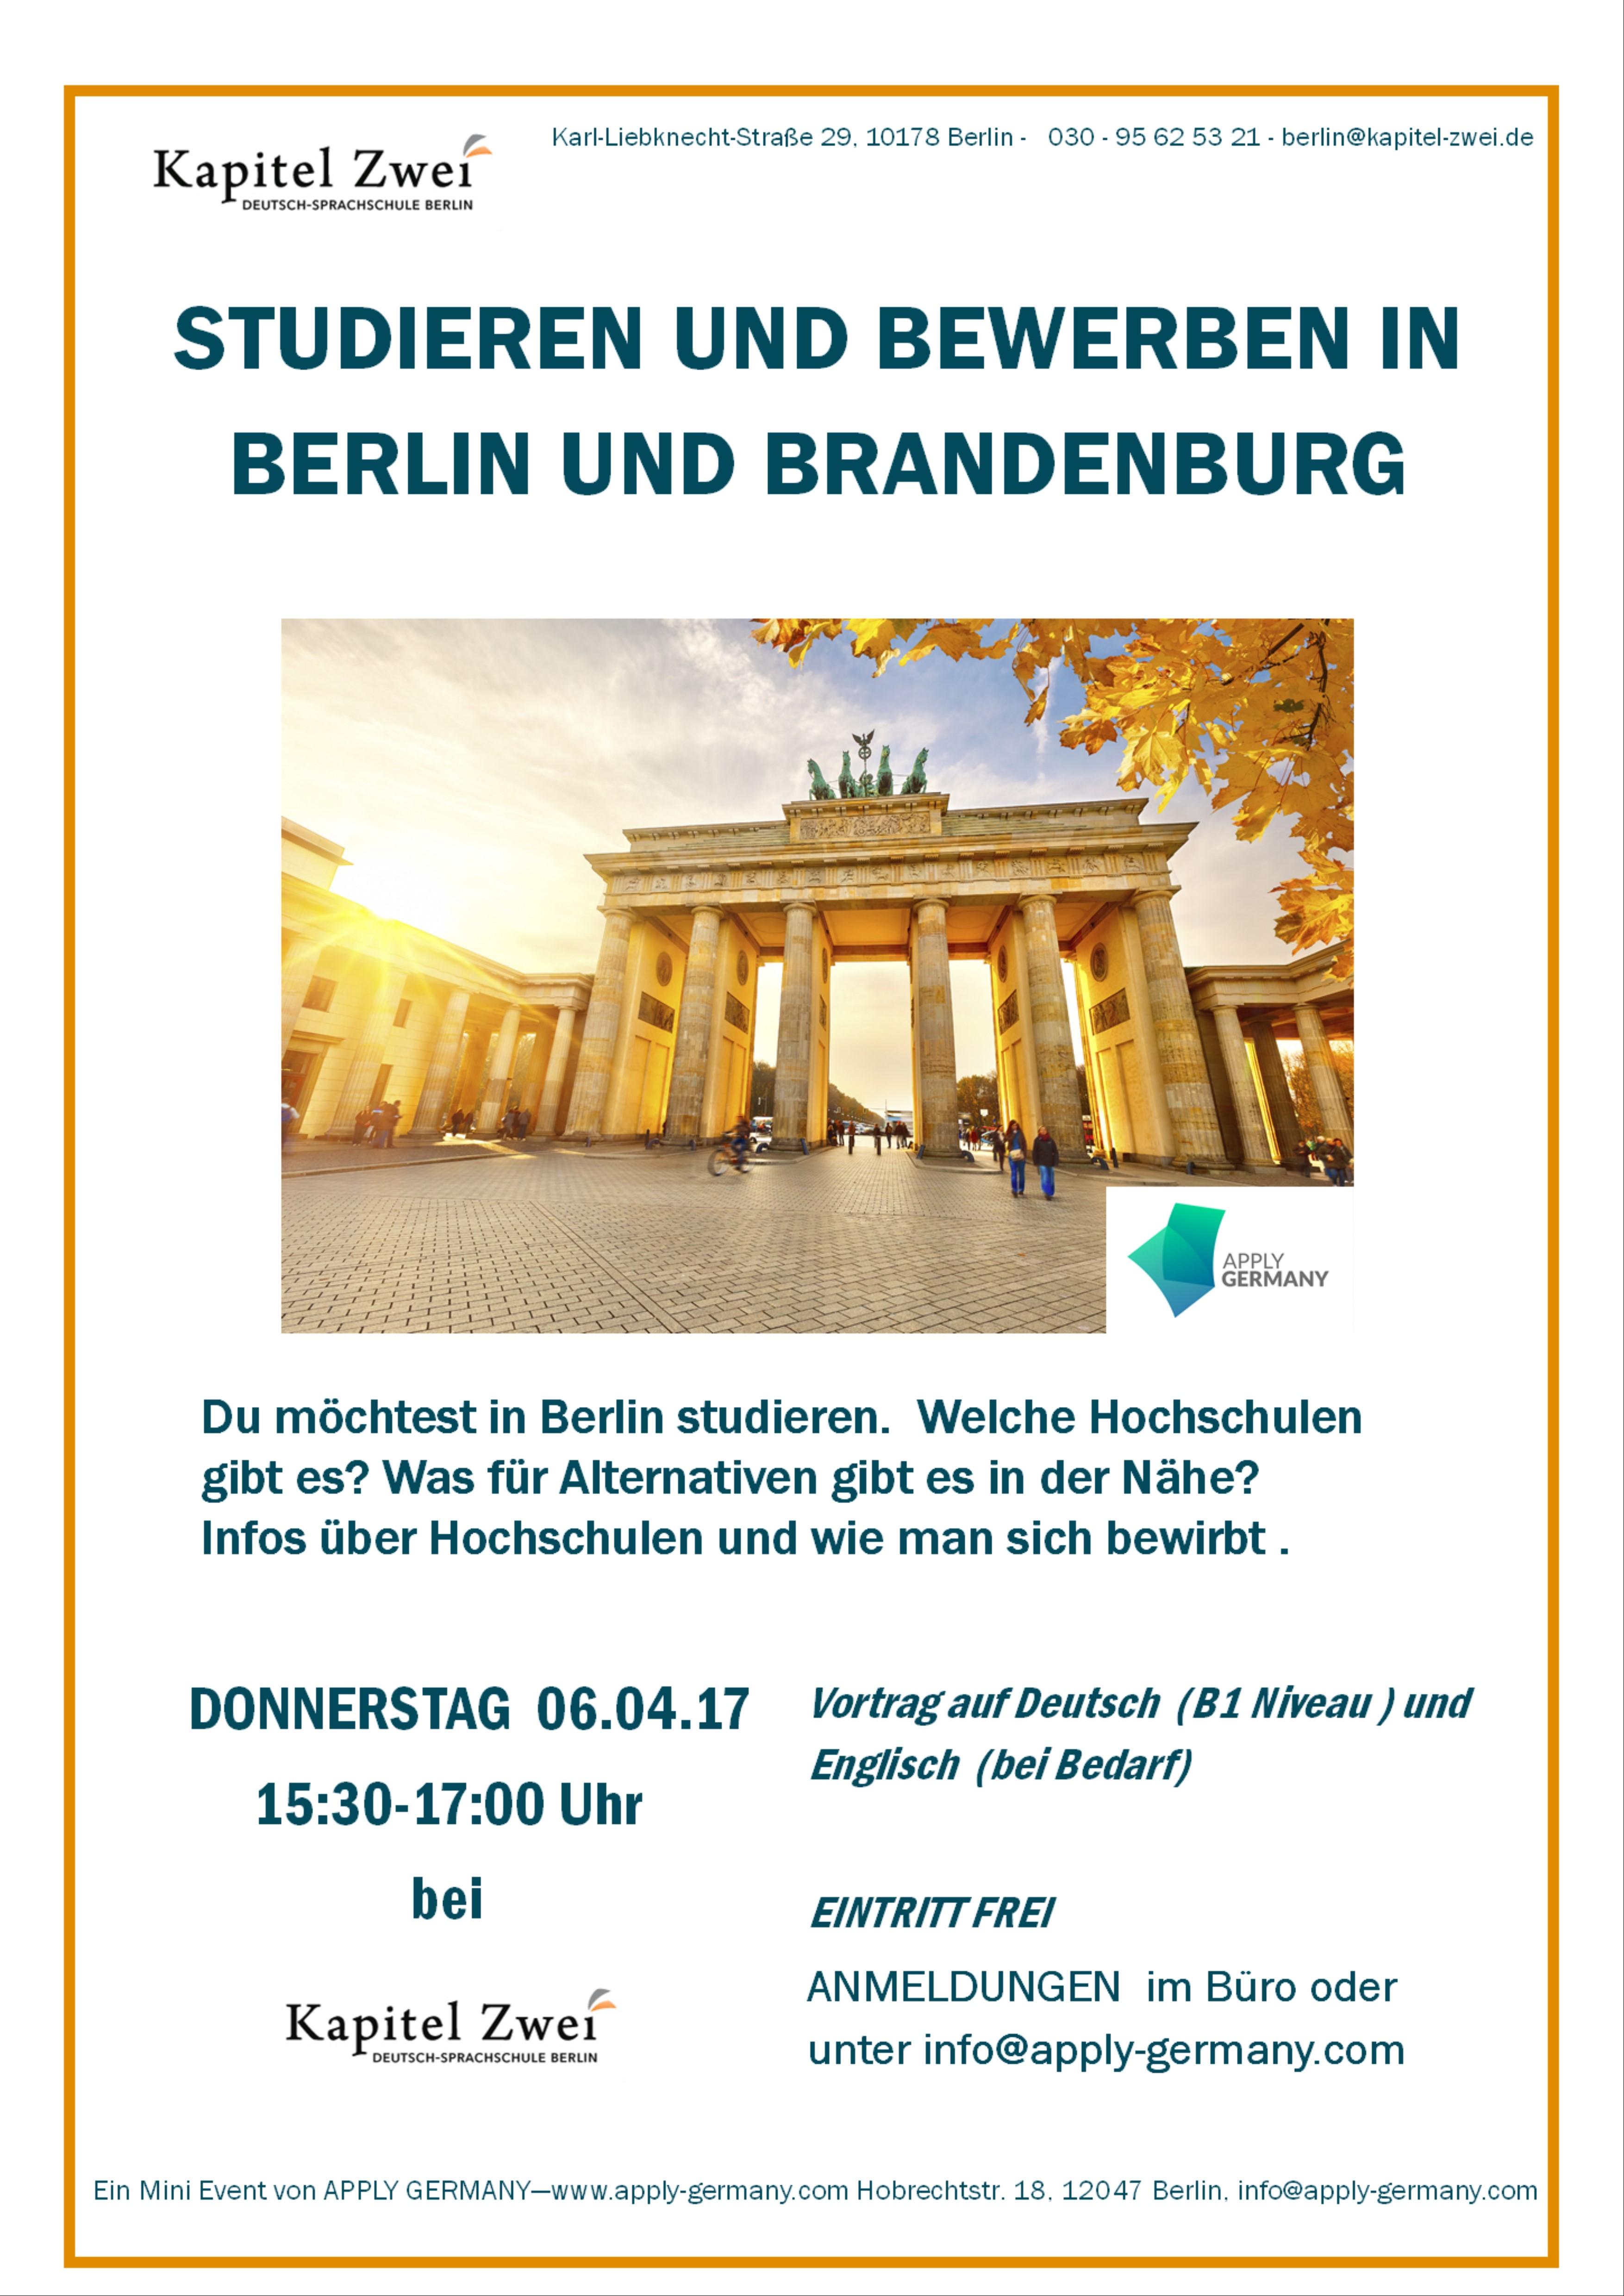 Kapitel Zwei Berlin Studieren in Berlin Brandenburg